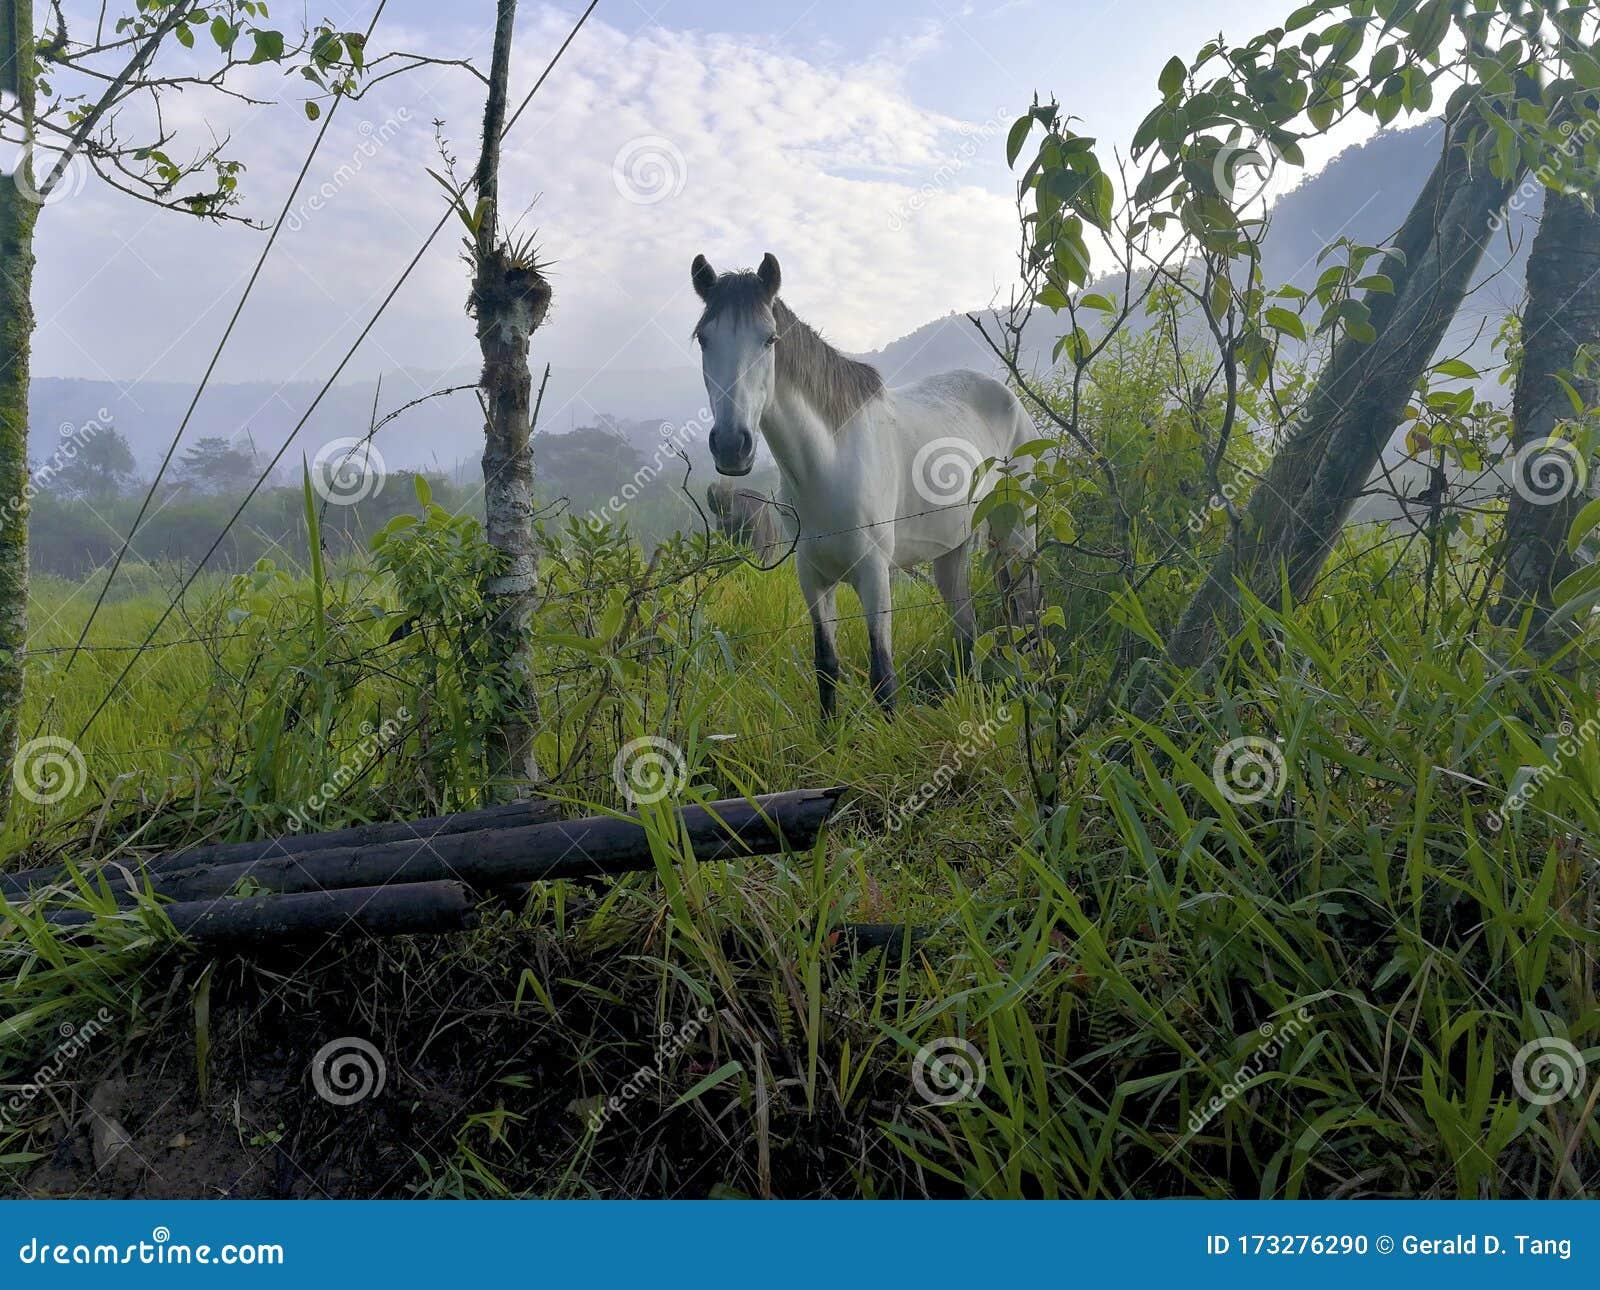 Horse Head On 835132 Stock Photo Image Of Livestock 173276290